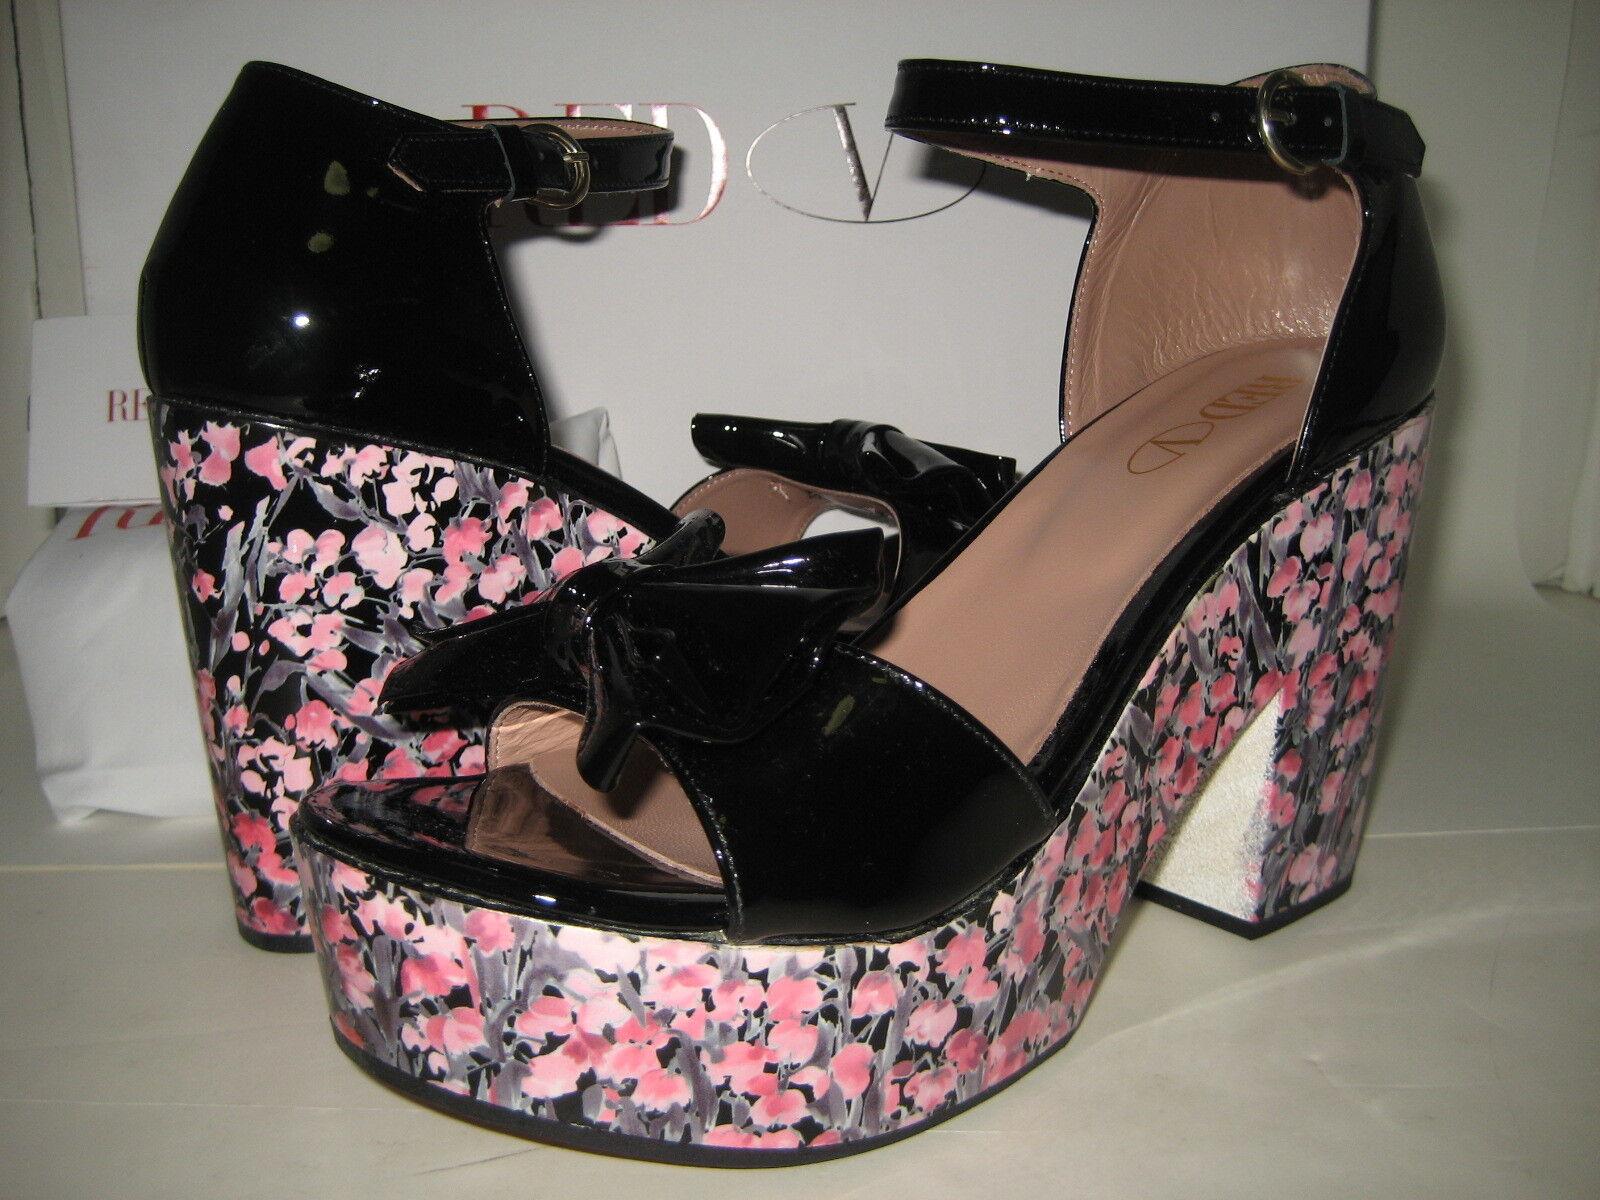 470 NEW rosso Valentino US 10 EU 40 Leather Floral Platform Heels Sandals scarpe